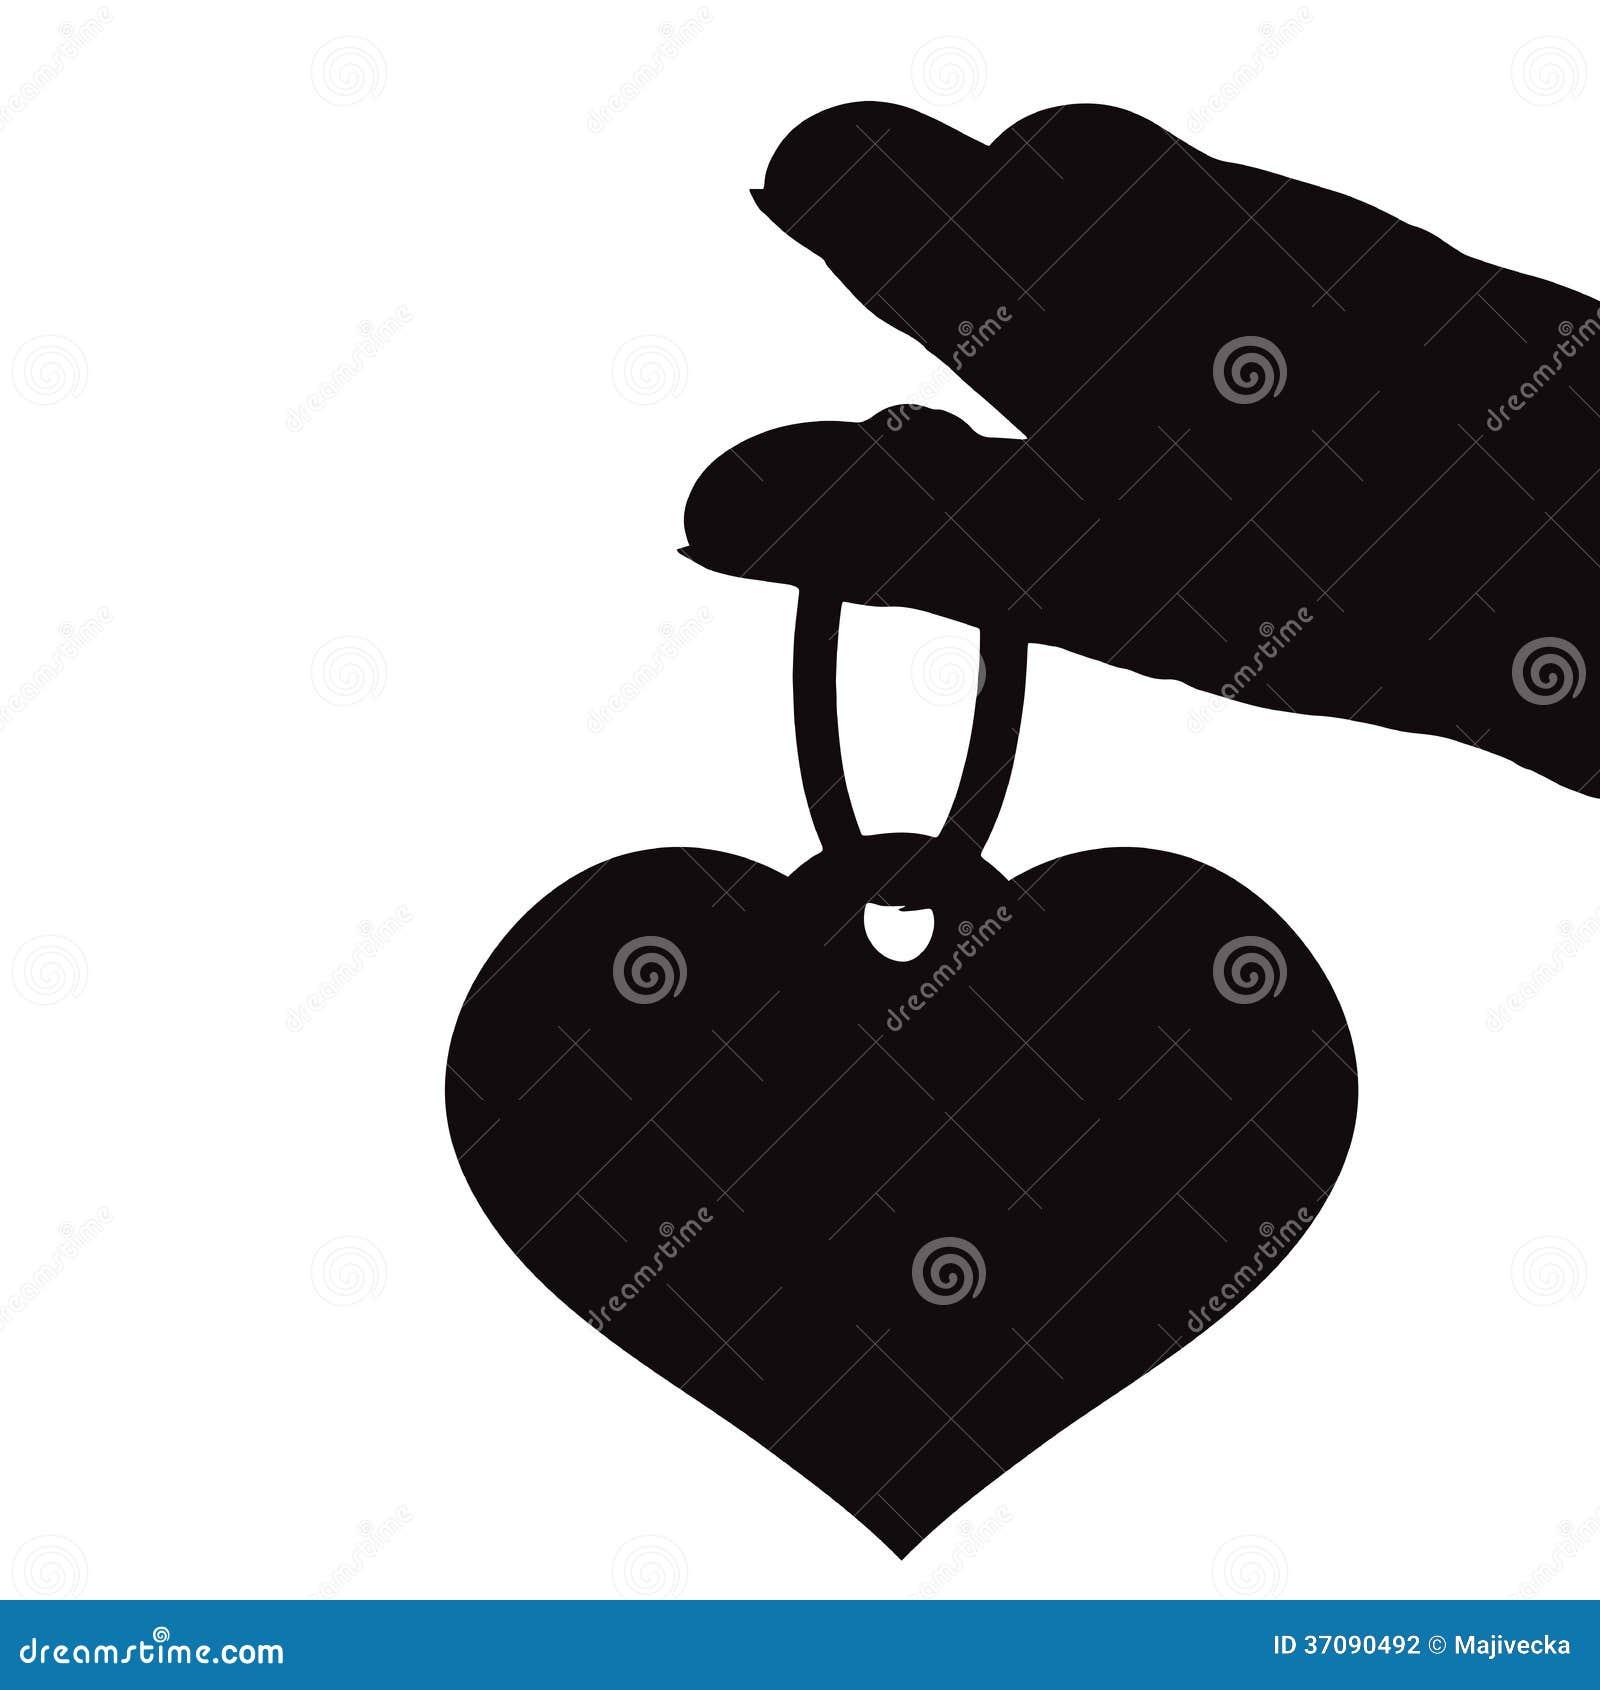 Download Wektorowa Sylwetki Ilustracja Serce. Ilustracja Wektor - Ilustracja złożonej z potomstwa, breloczek: 37090492